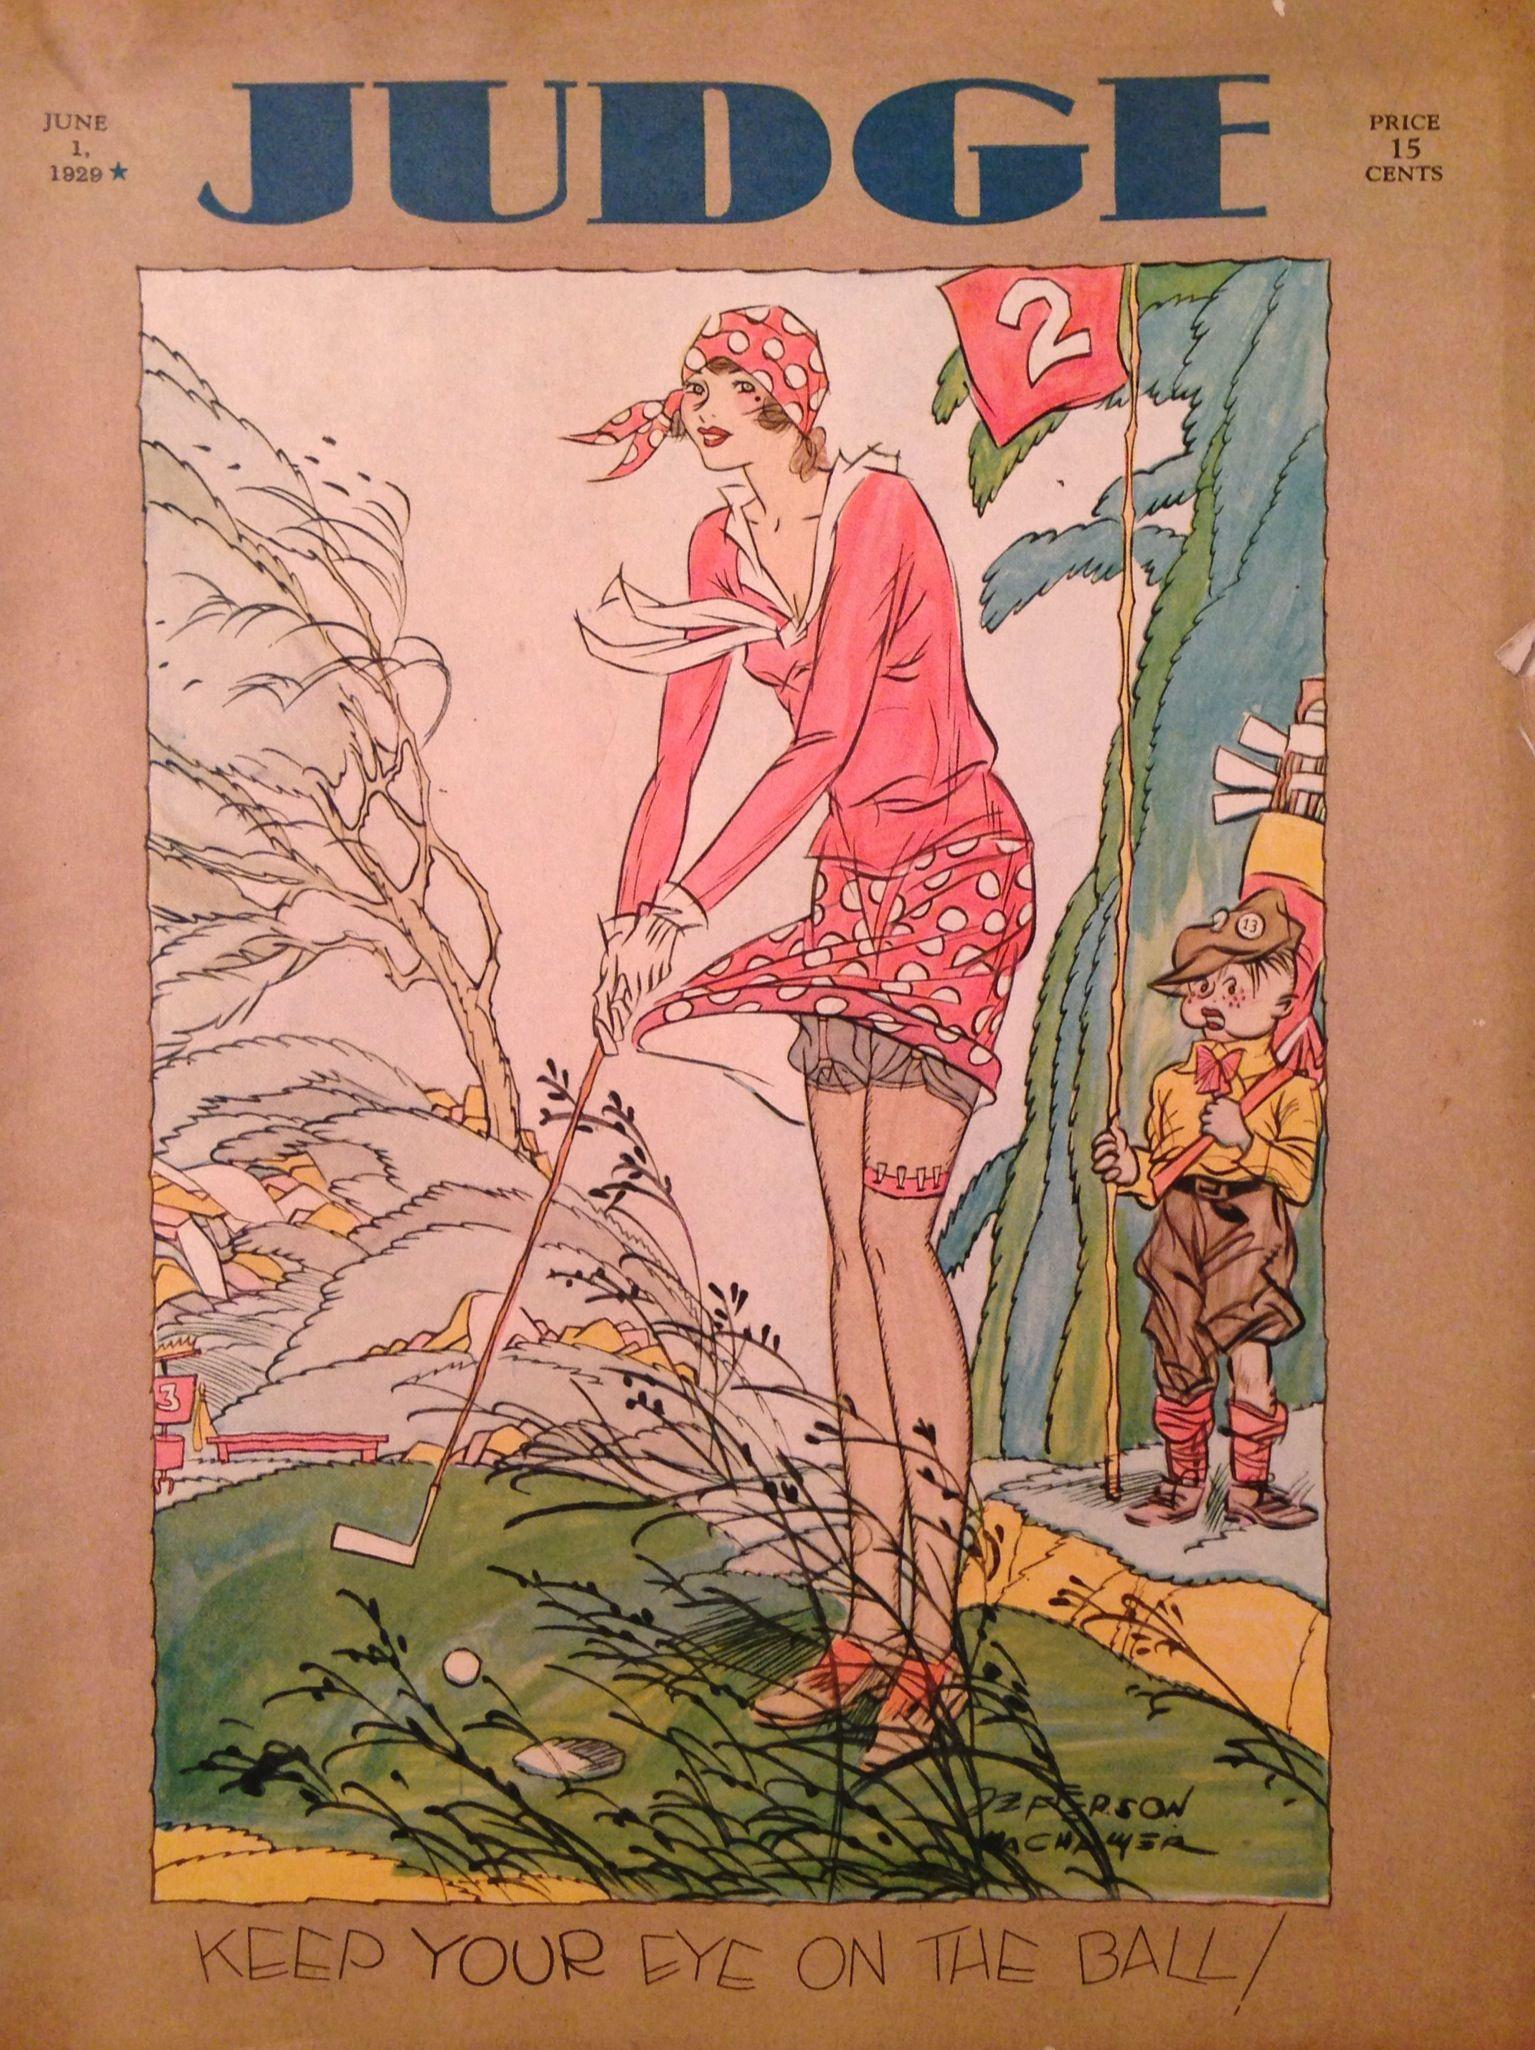 Judge Magazine June 1929 Lady Golfer Cover